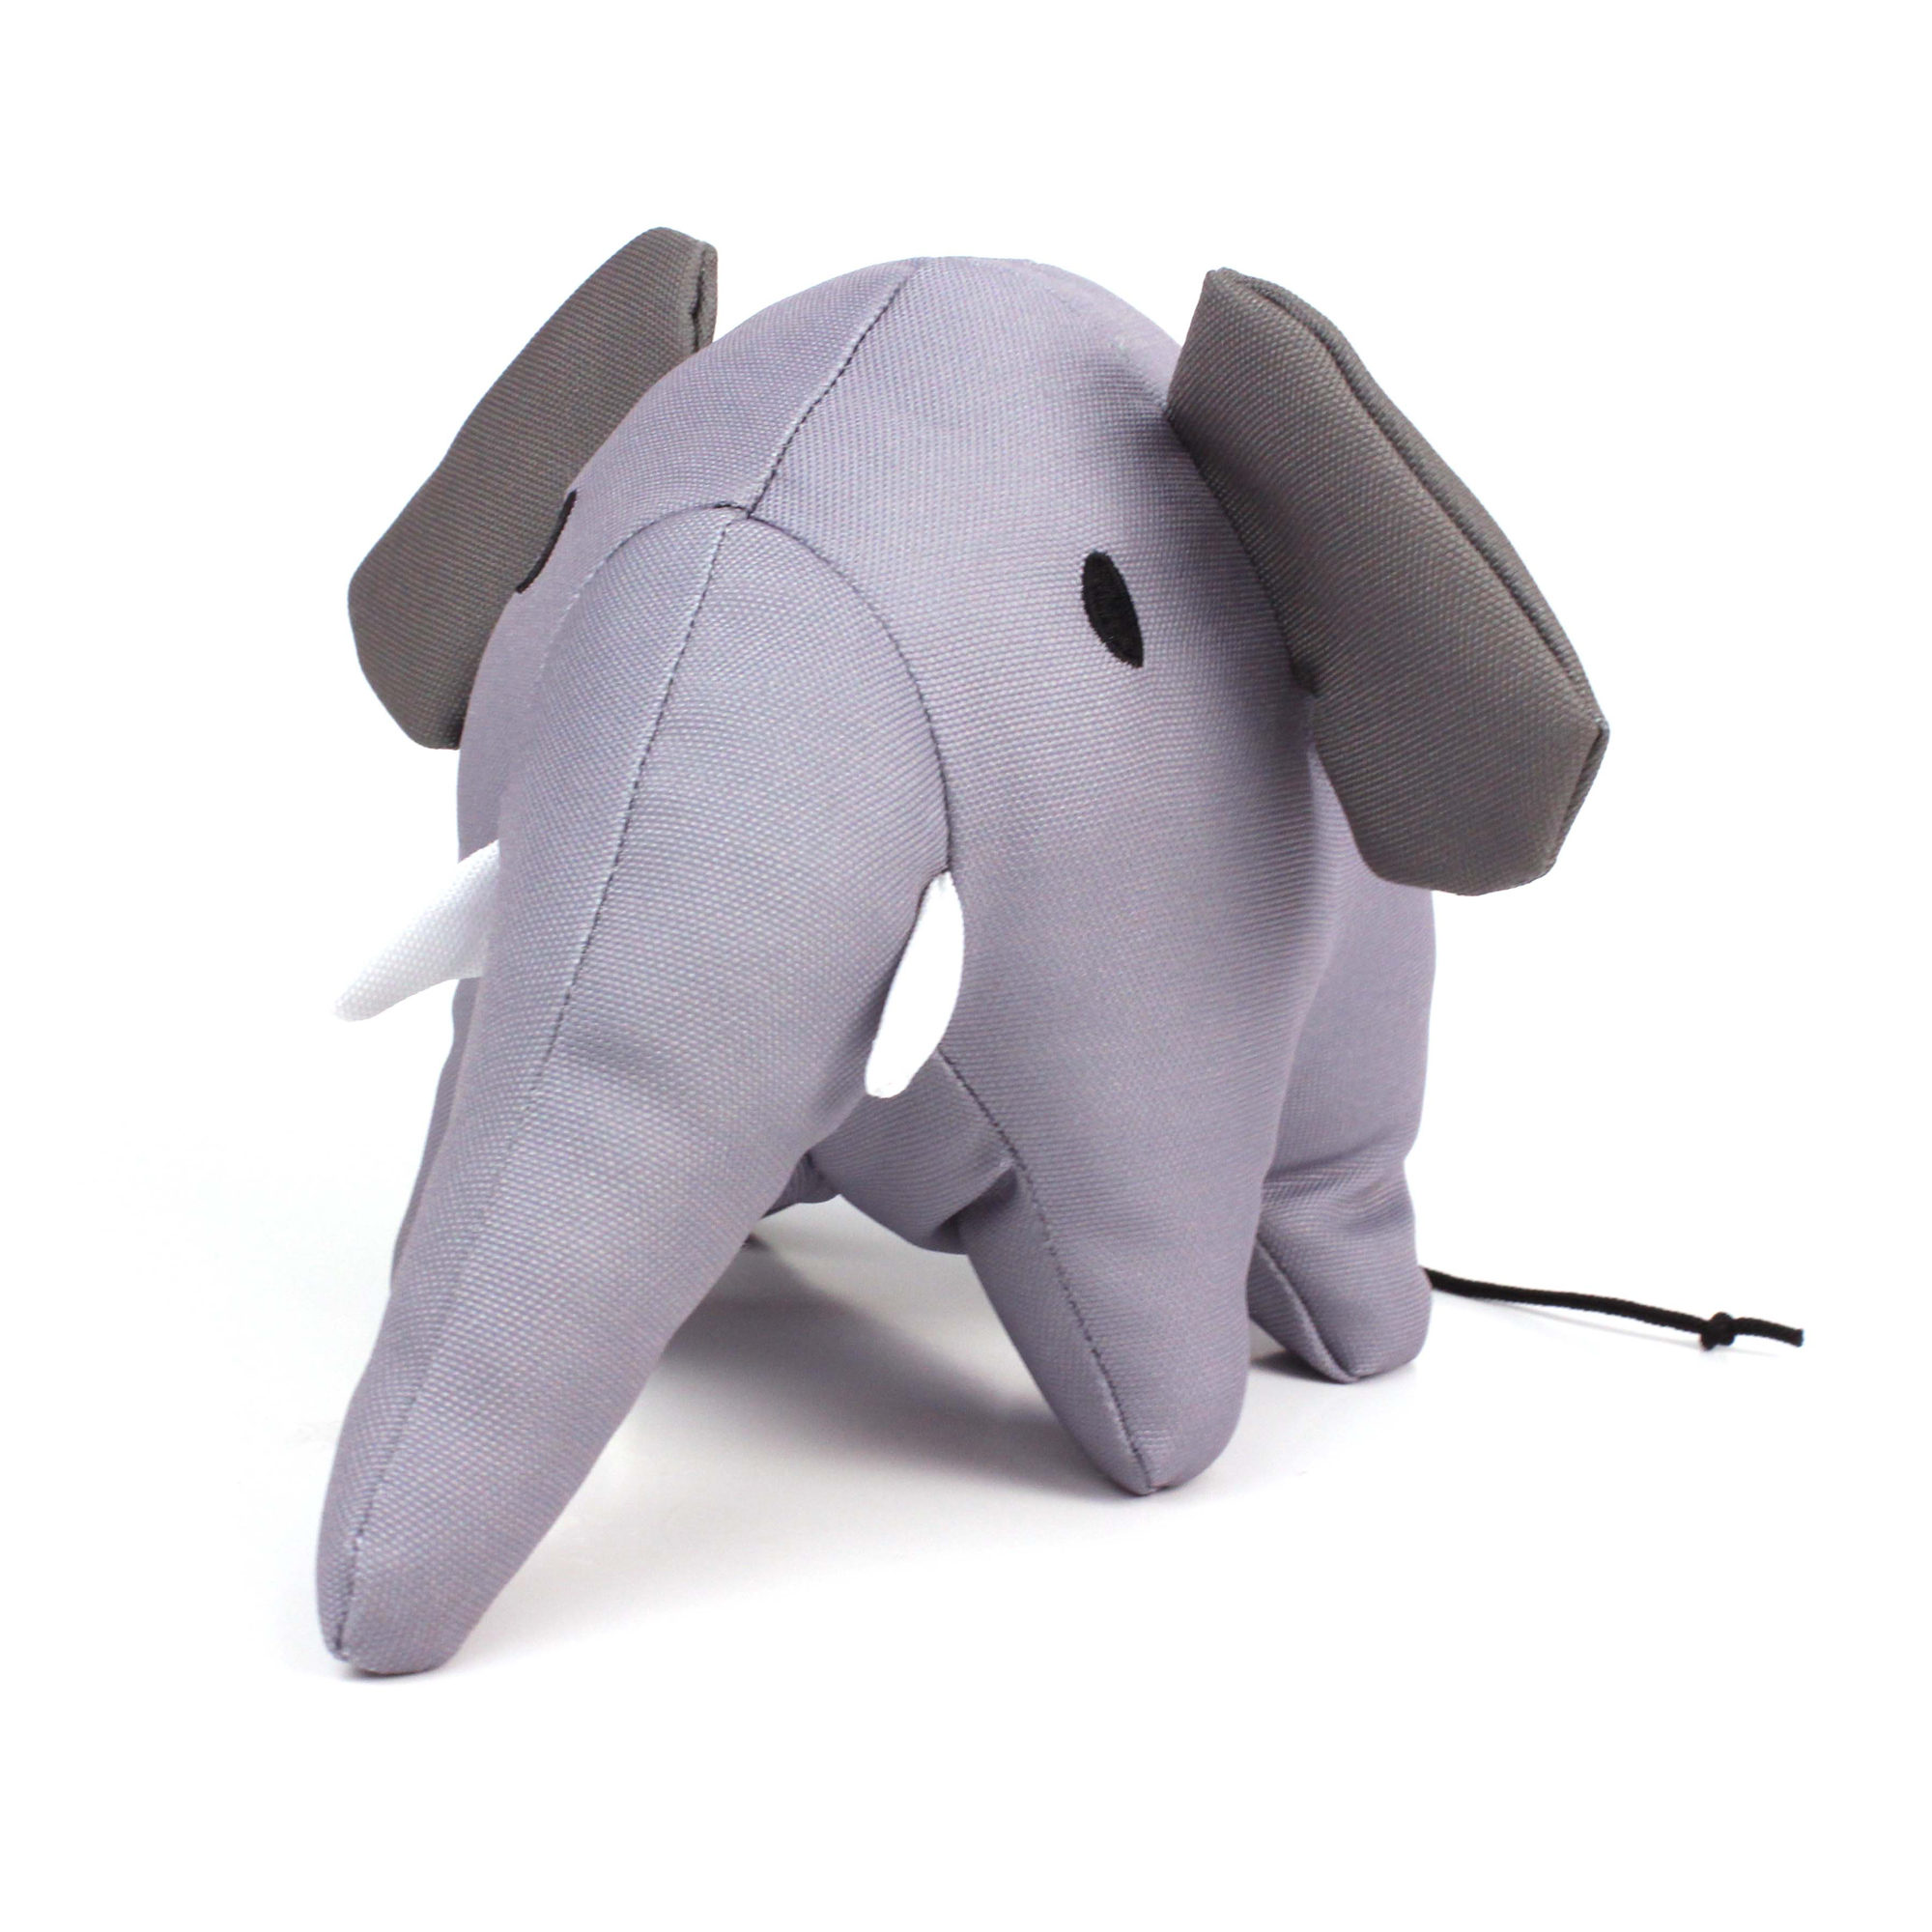 Beco Cuddly Soft Toy Estella the Elephant